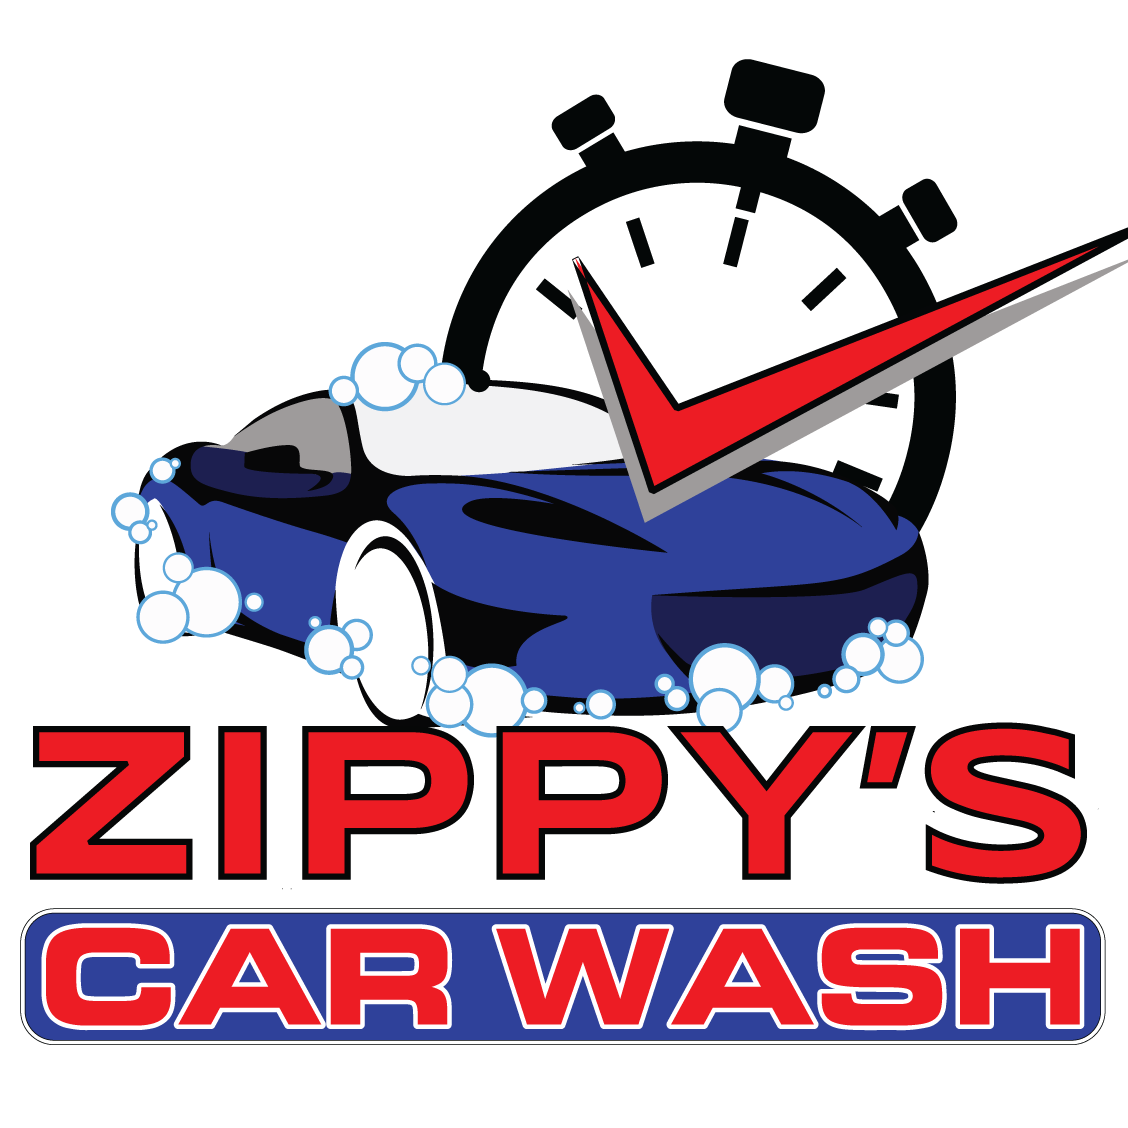 Zippy's Car Wash